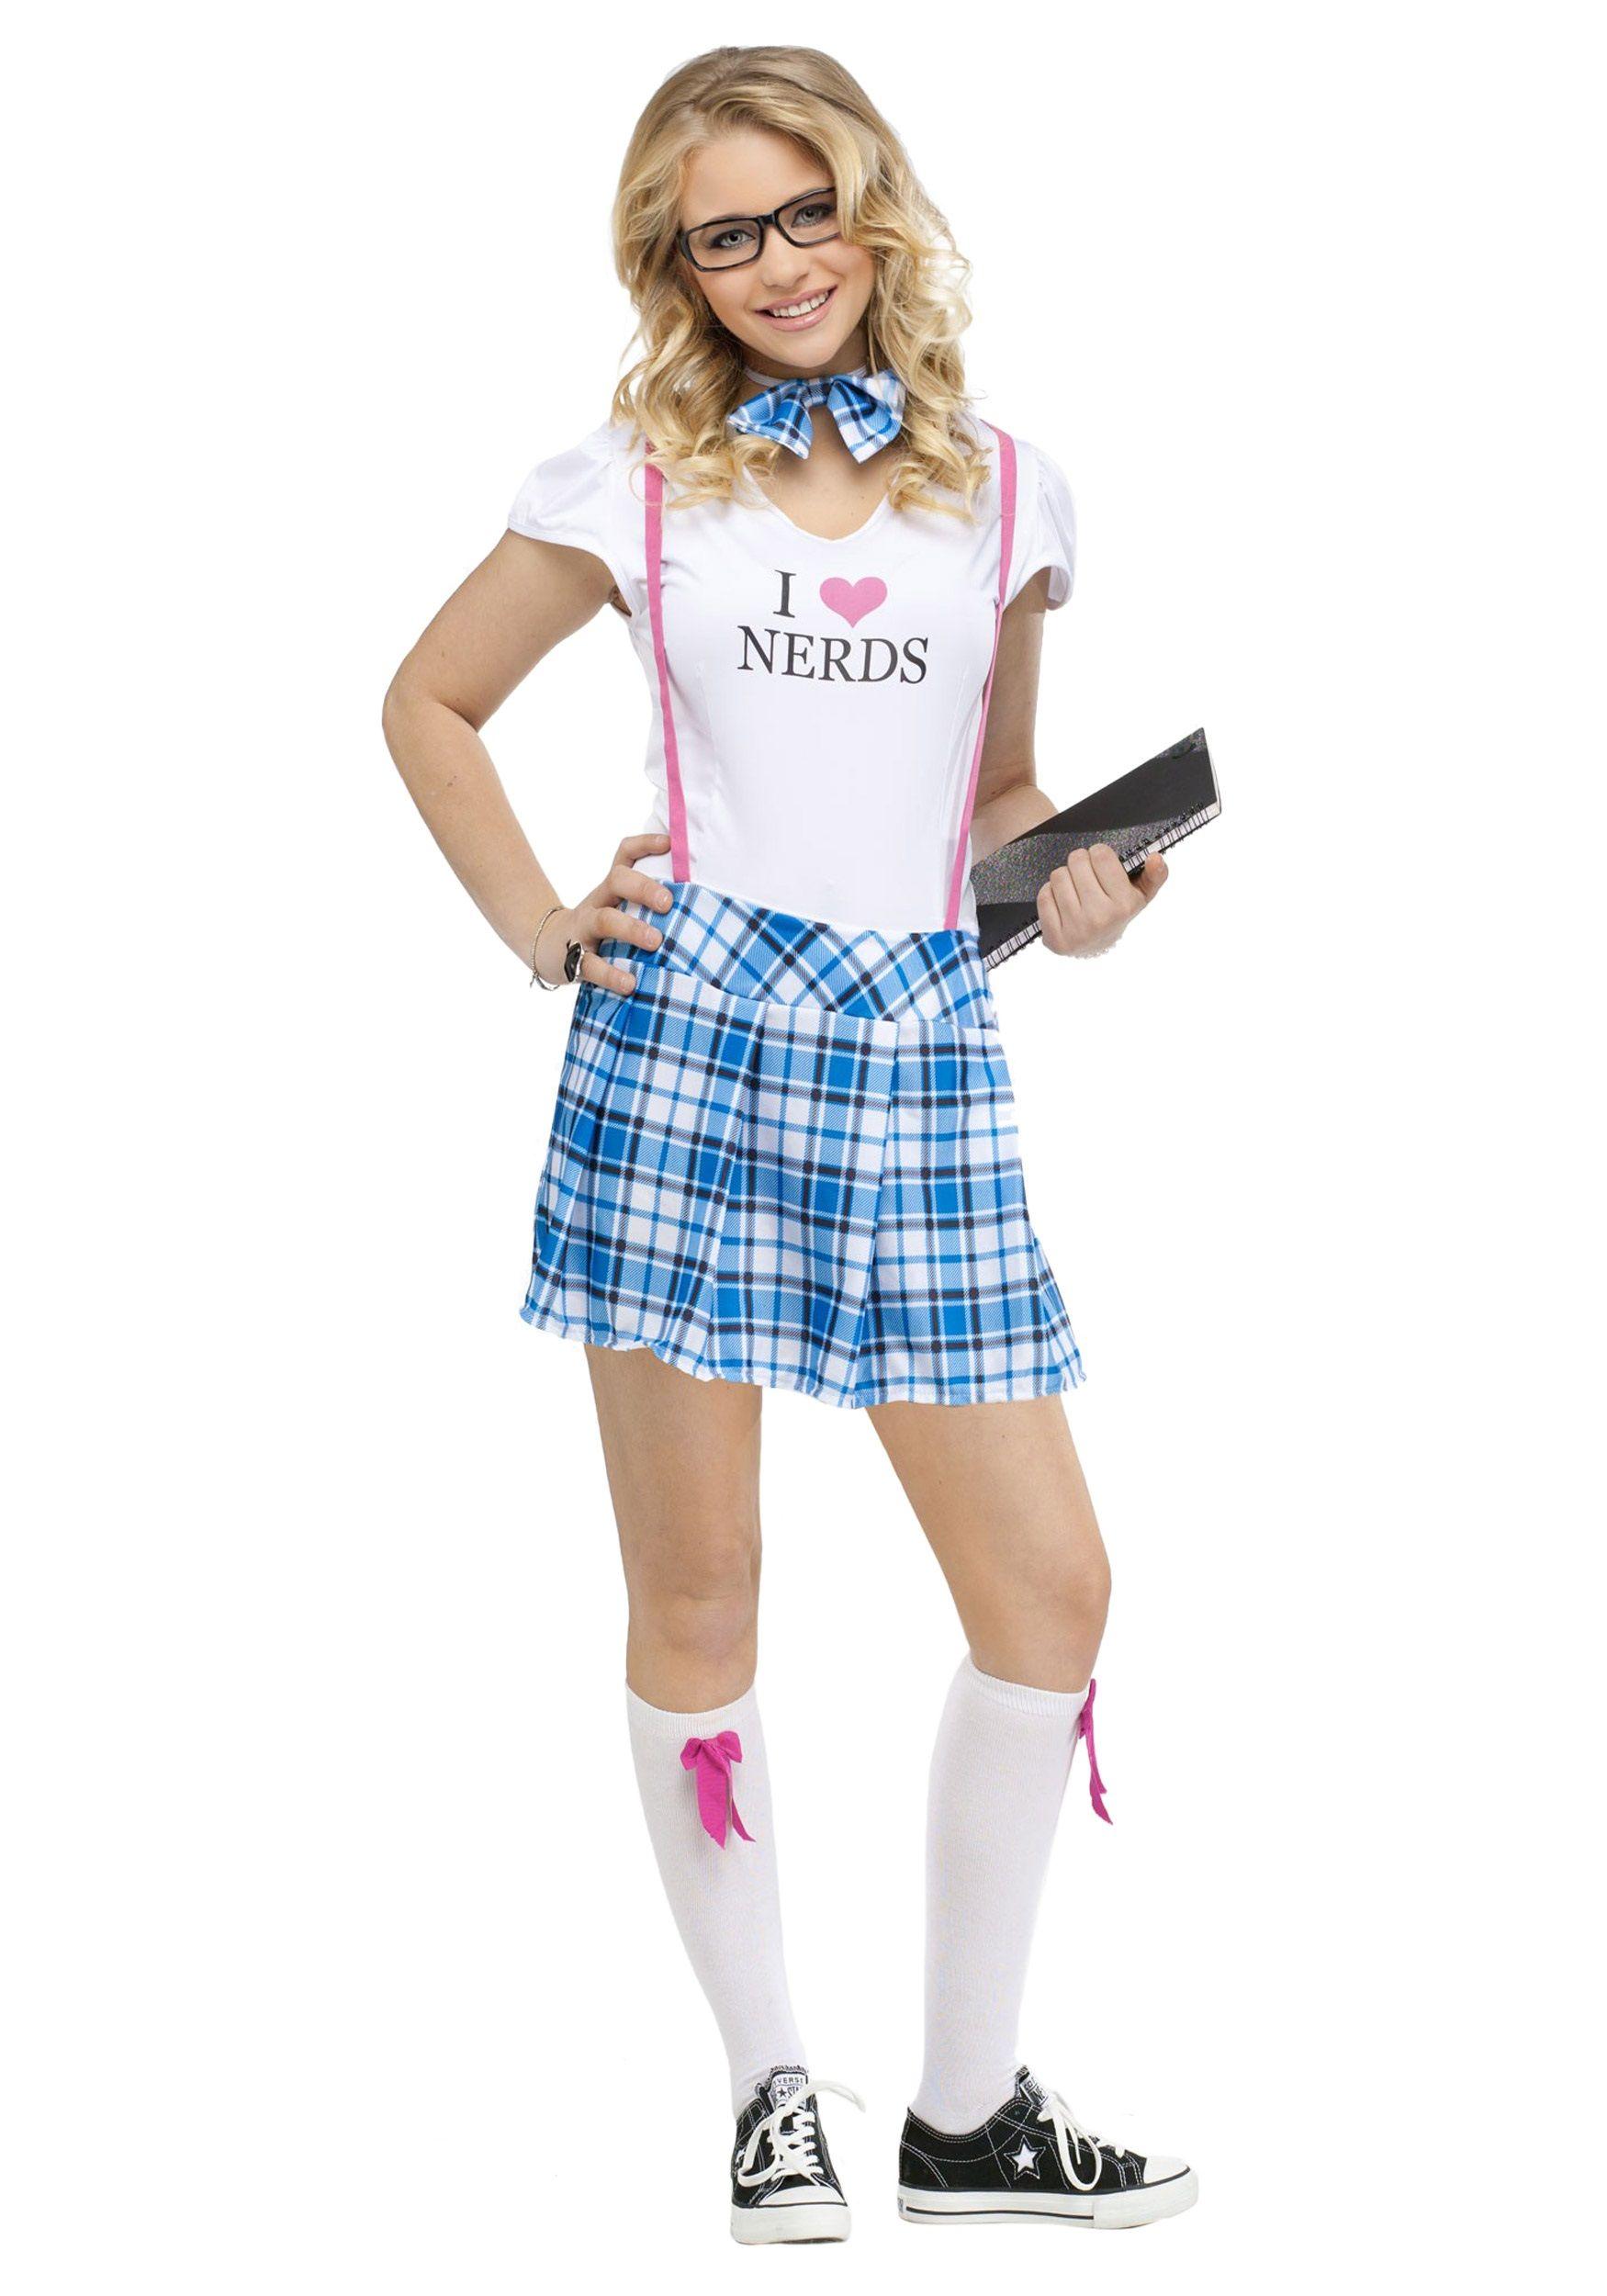 nerd costumes adult nerd and geek costume ideas sexy girl nerd costume - Cute Halloween Costumes For School